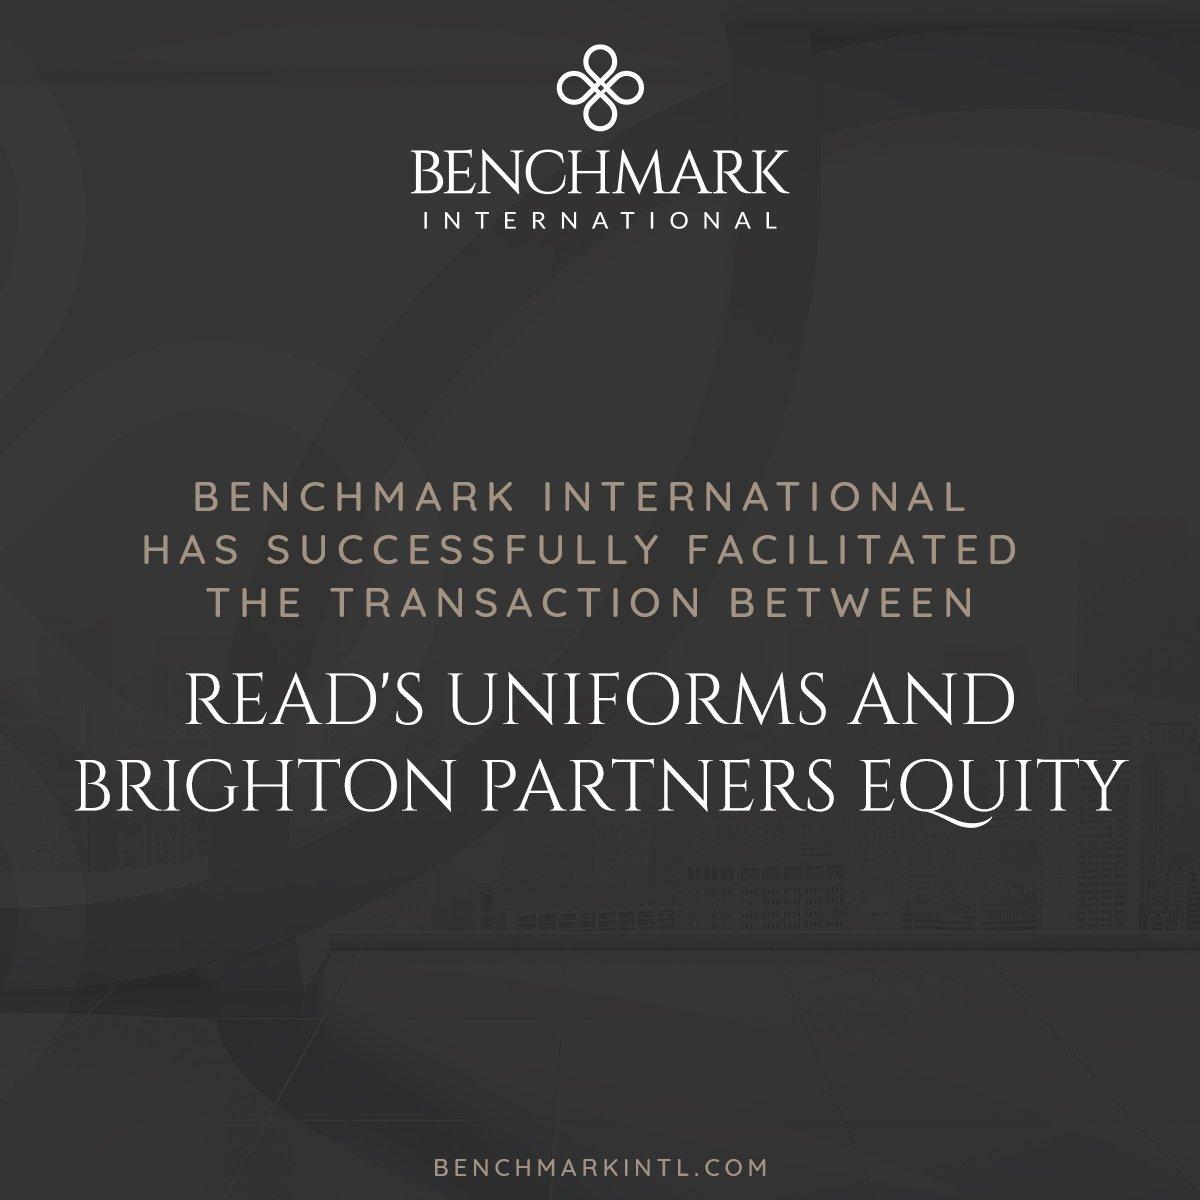 Read_Uniforms_&_Brighton_Partners_Equity_Social